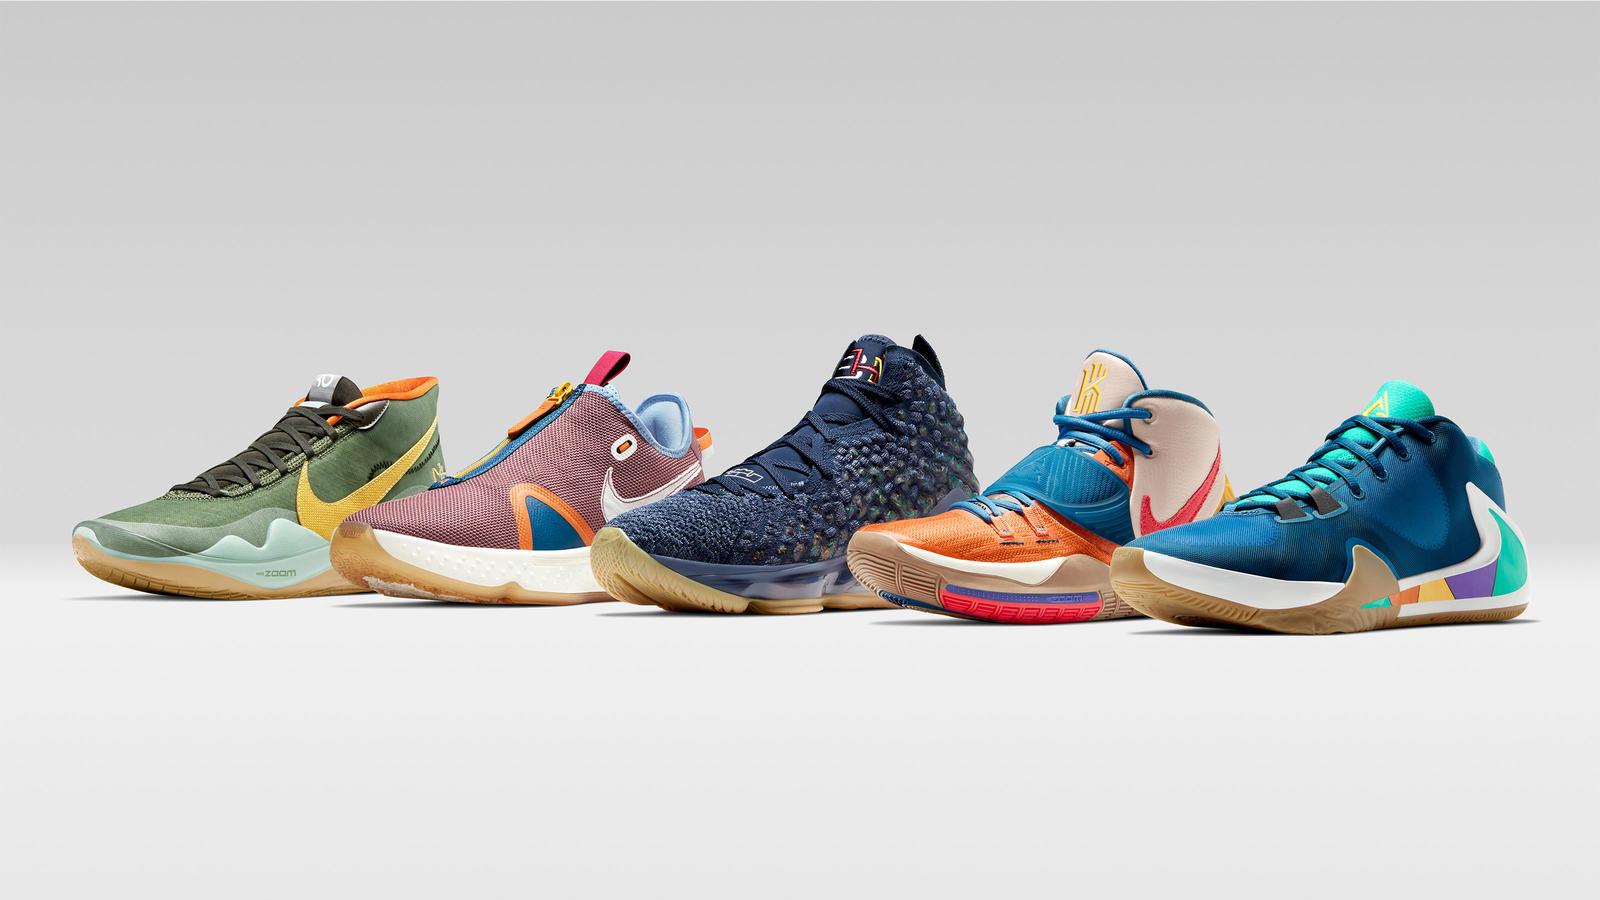 Black History Month 2020 Nike Basketball LEBRON 17 KYRIE 6 KD12 1600x900